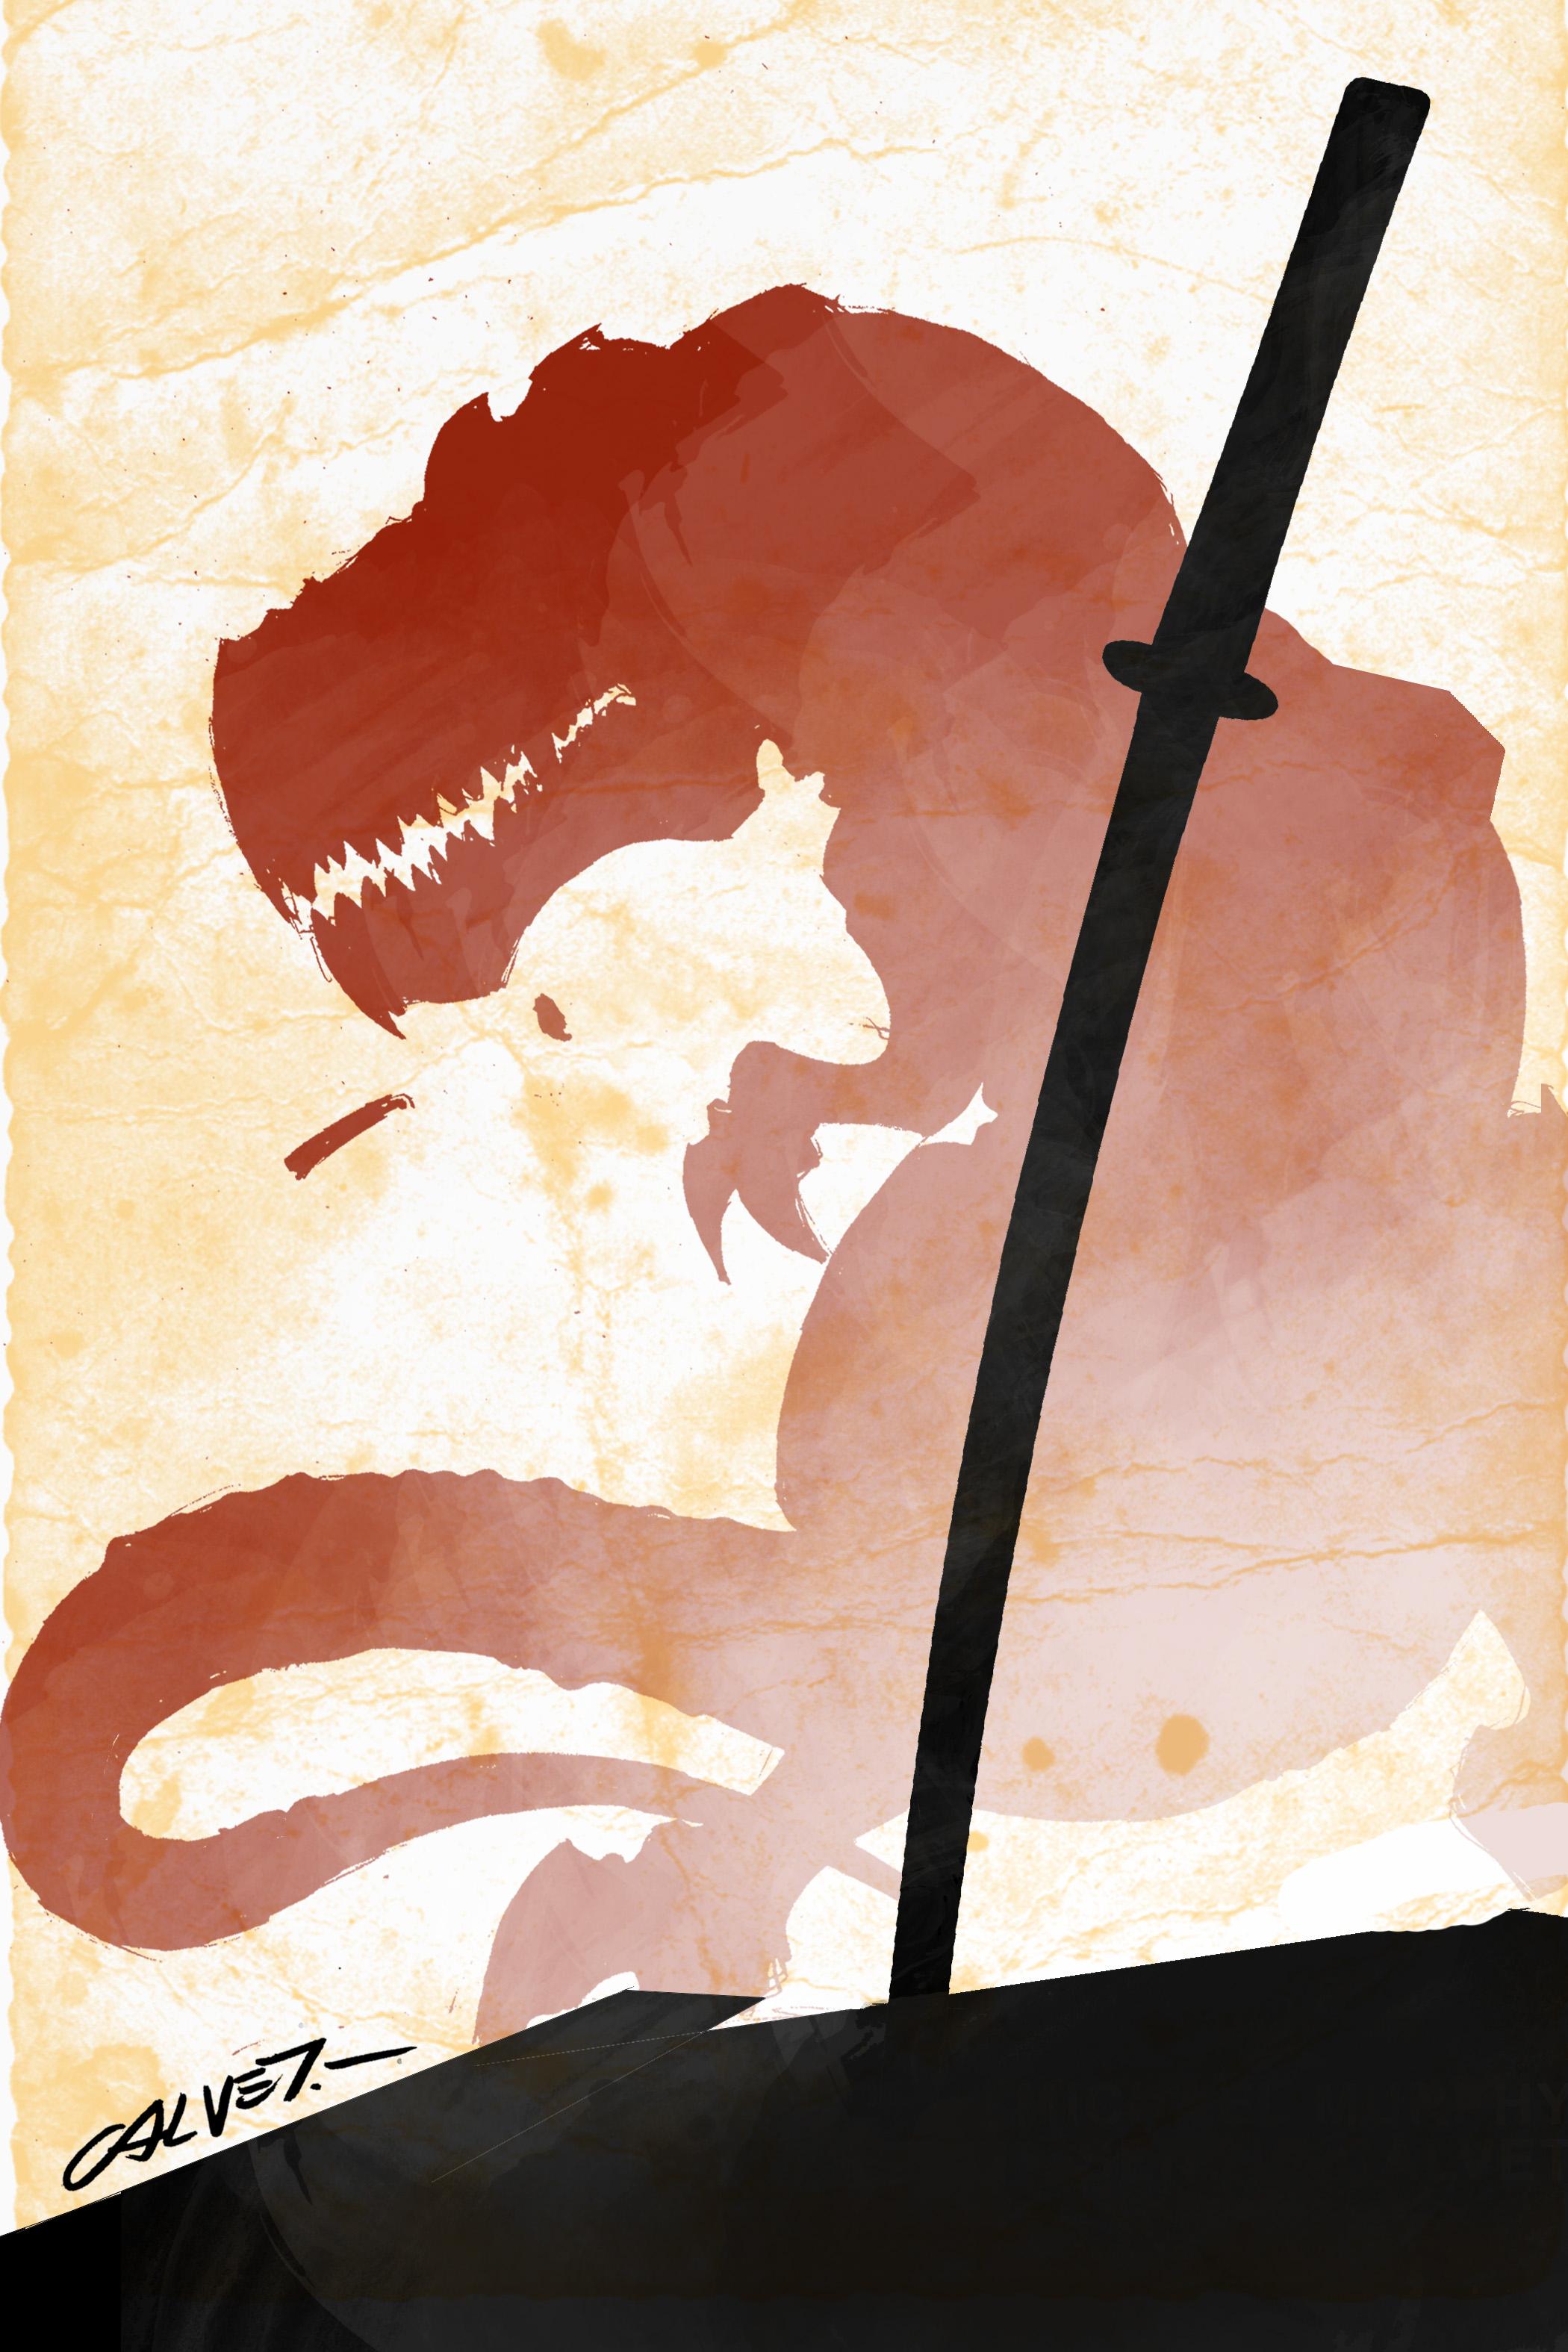 Samurai And Dinosaurs: A Graphic Novel